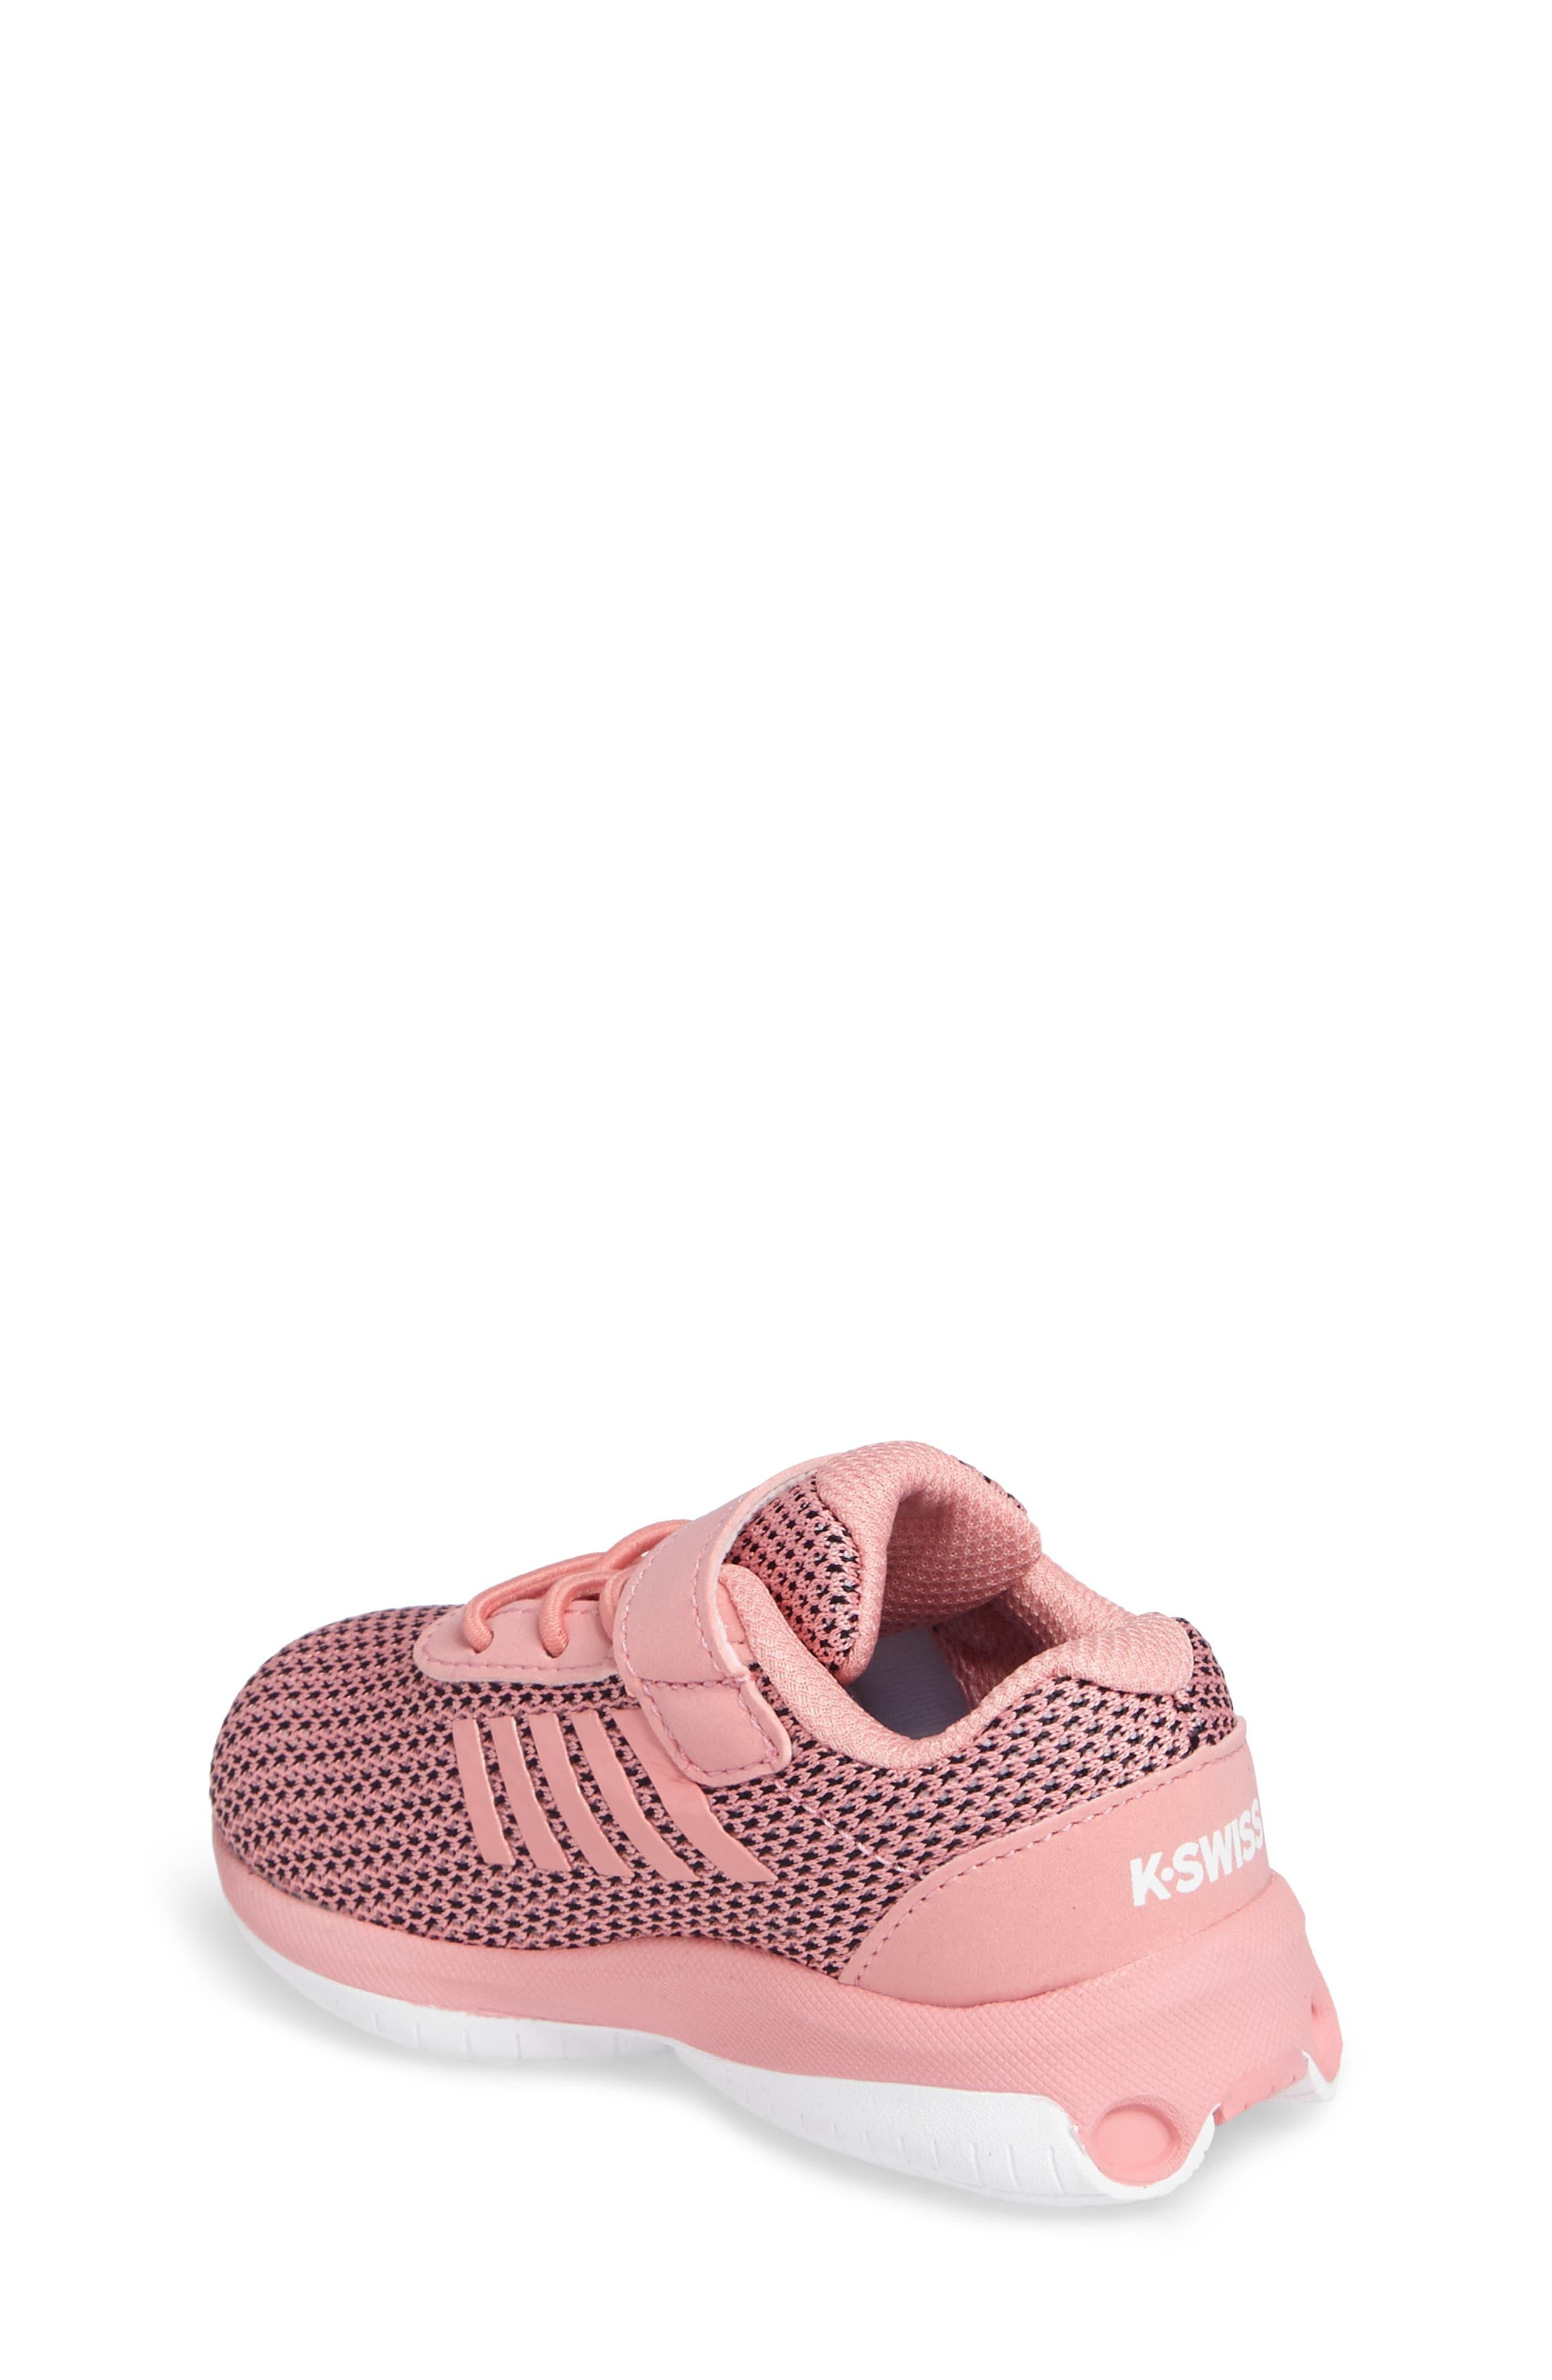 Tubes Infinity Sneaker,                             Alternate thumbnail 2, color,                             Flamingo Pink/ White